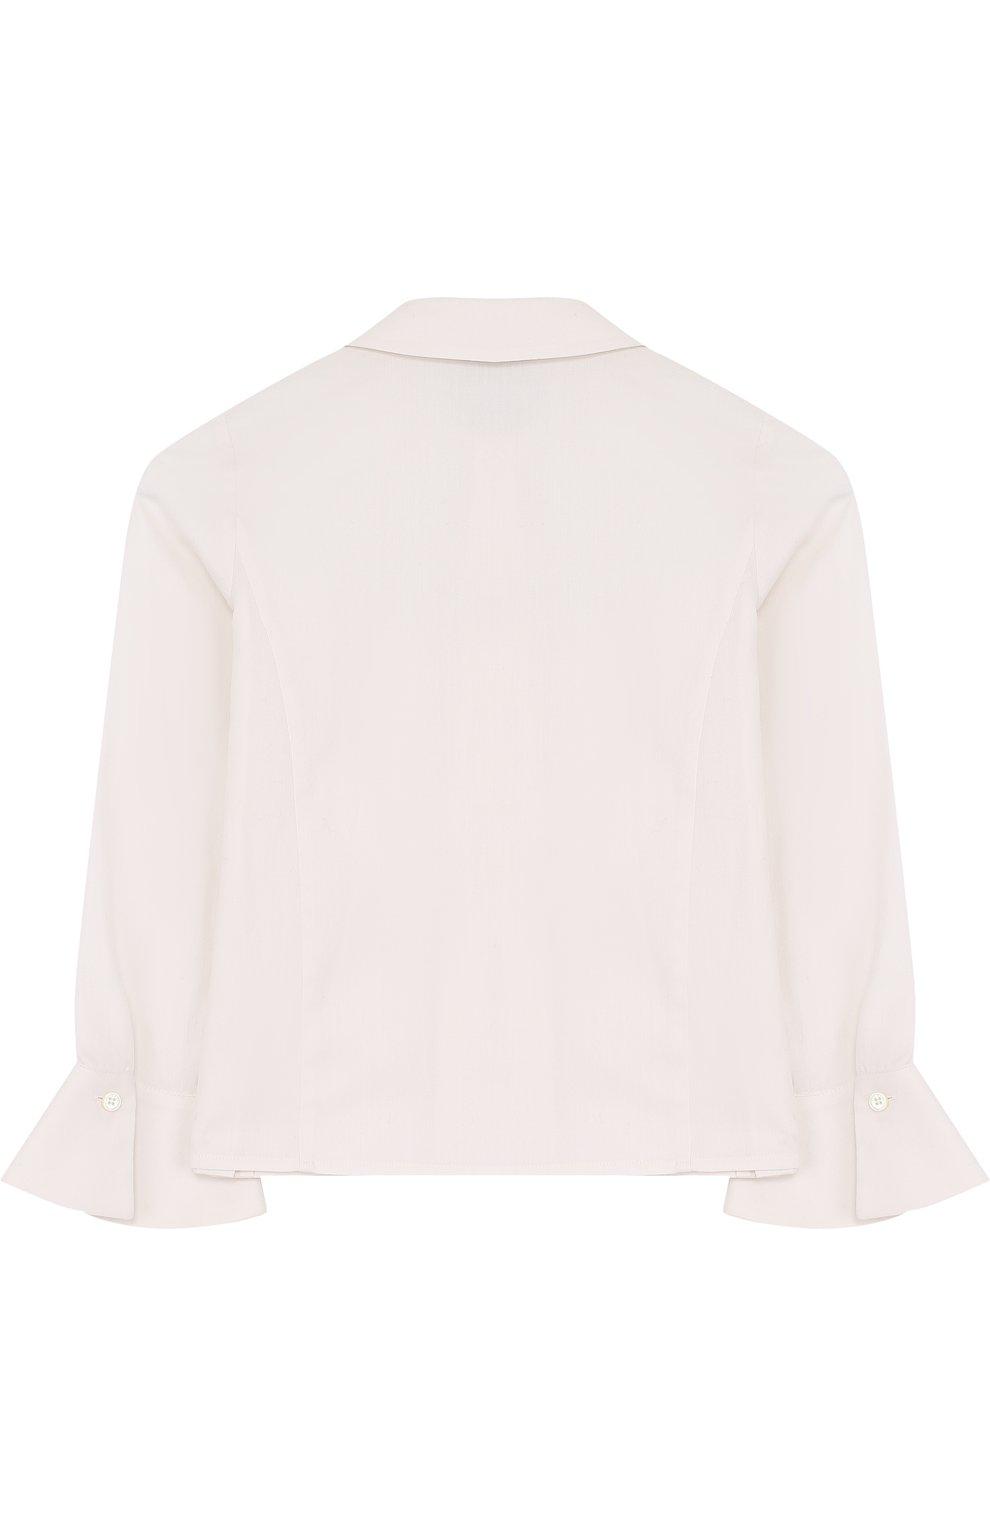 Хлопковая блуза с оборками   Фото №2